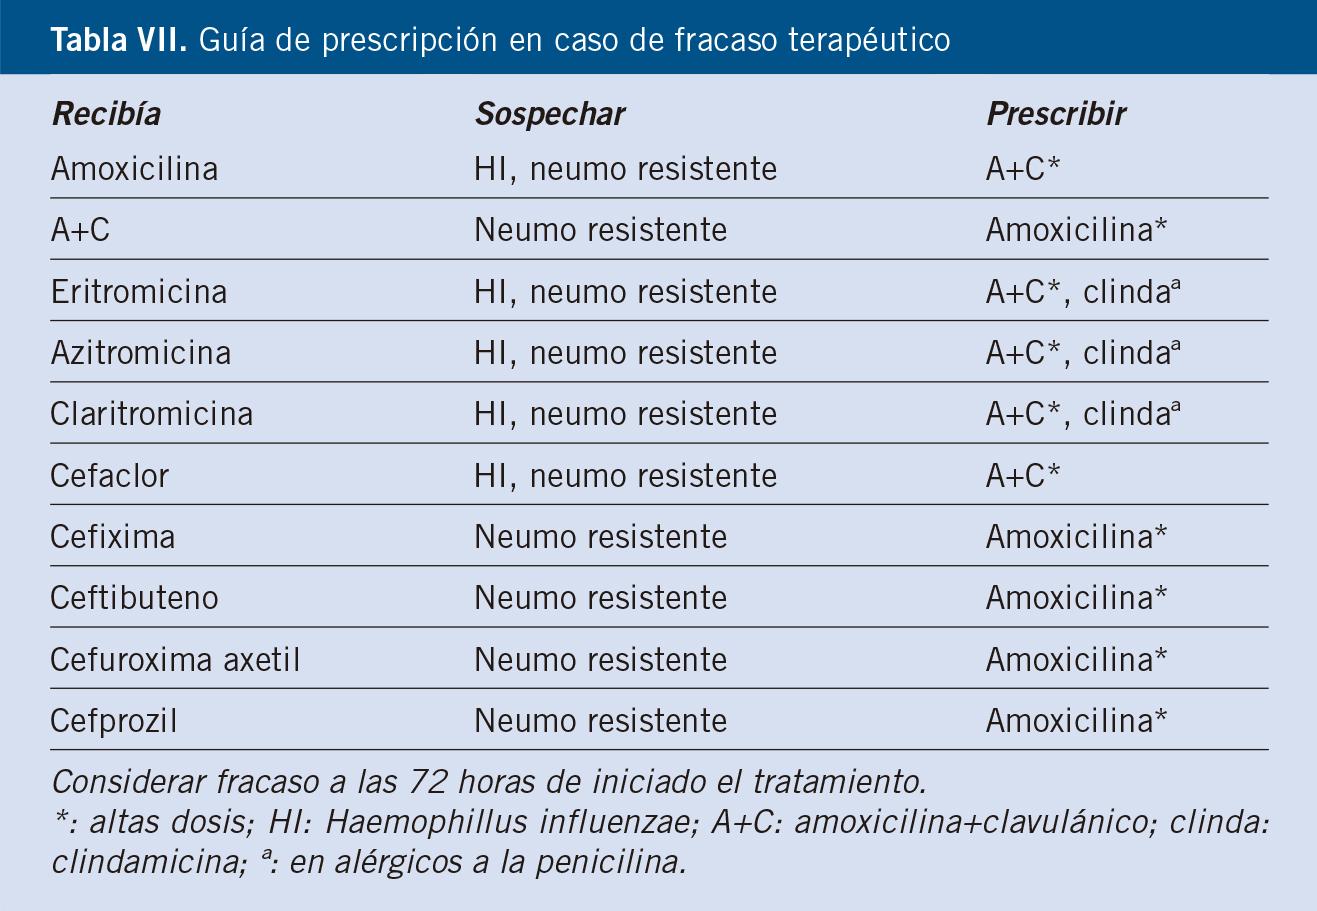 meningoencefalitis tuberculosa corticosteroides contraindicaciones